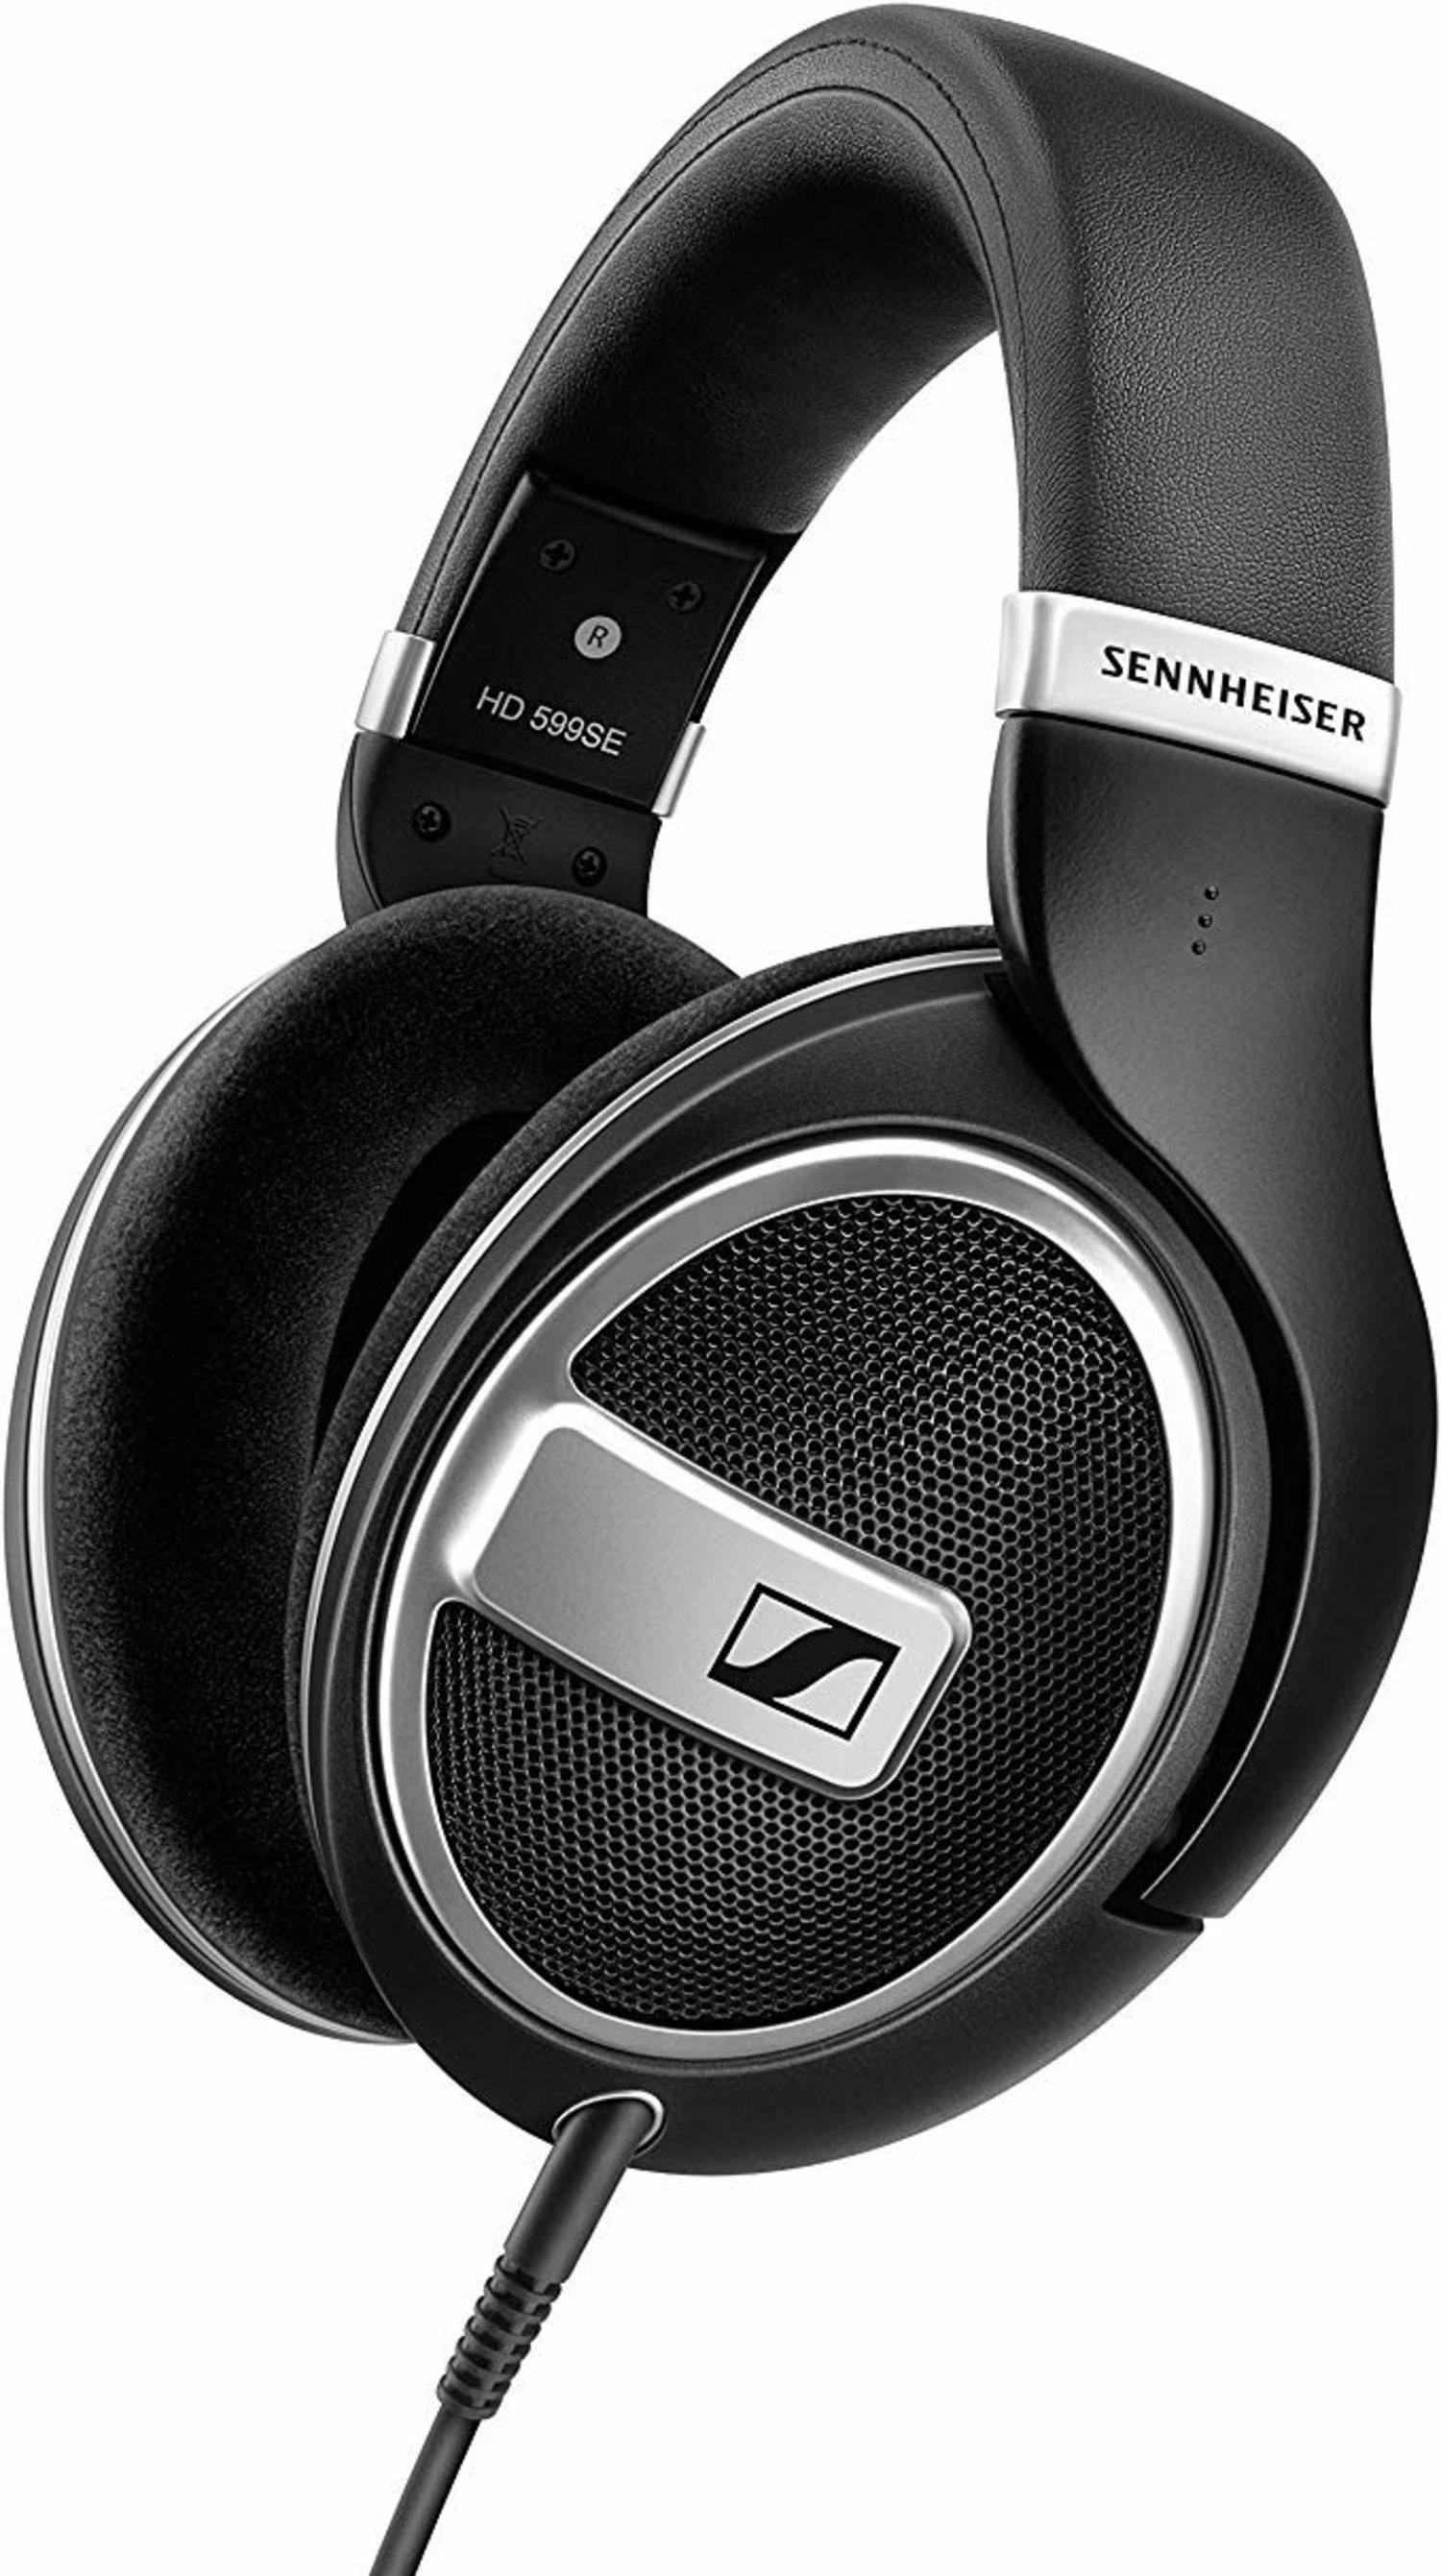 Sennheiser, auriculares de primera clase con gran cancelación de ruido.